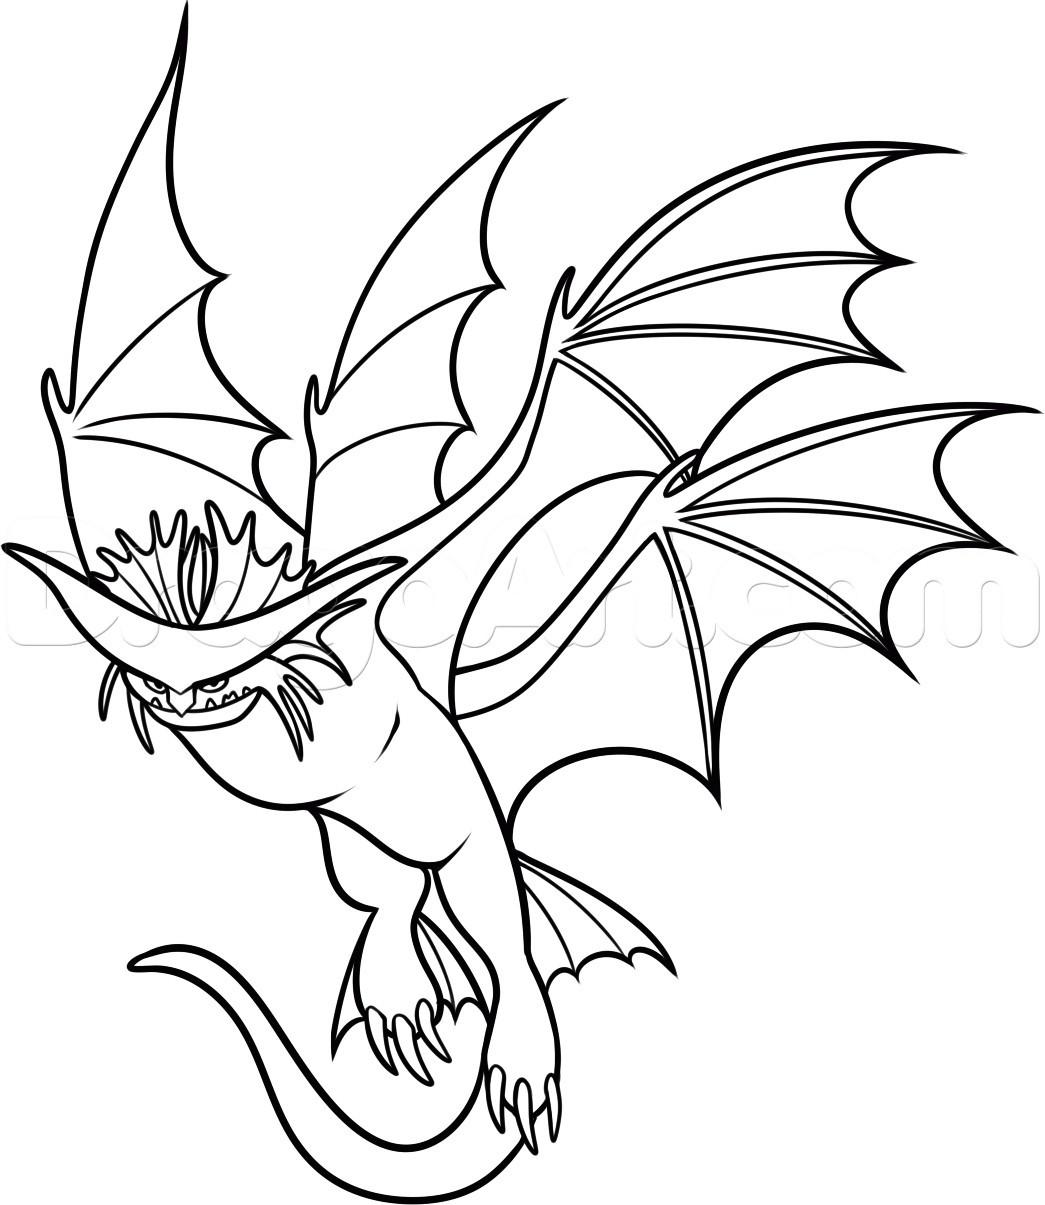 Раскраска дракон 7